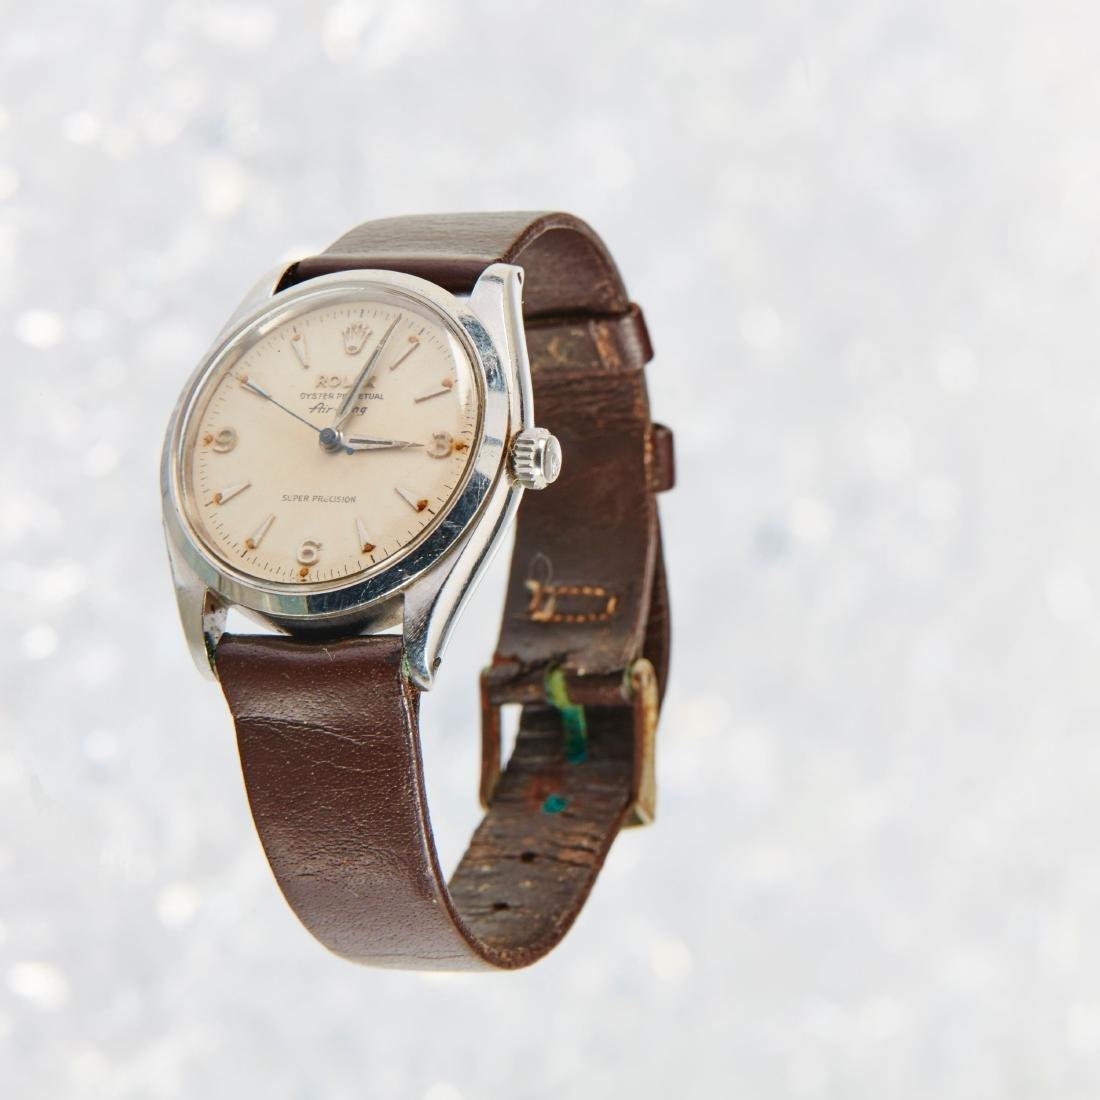 Rolex, Air King, Ref. 6552 - 2